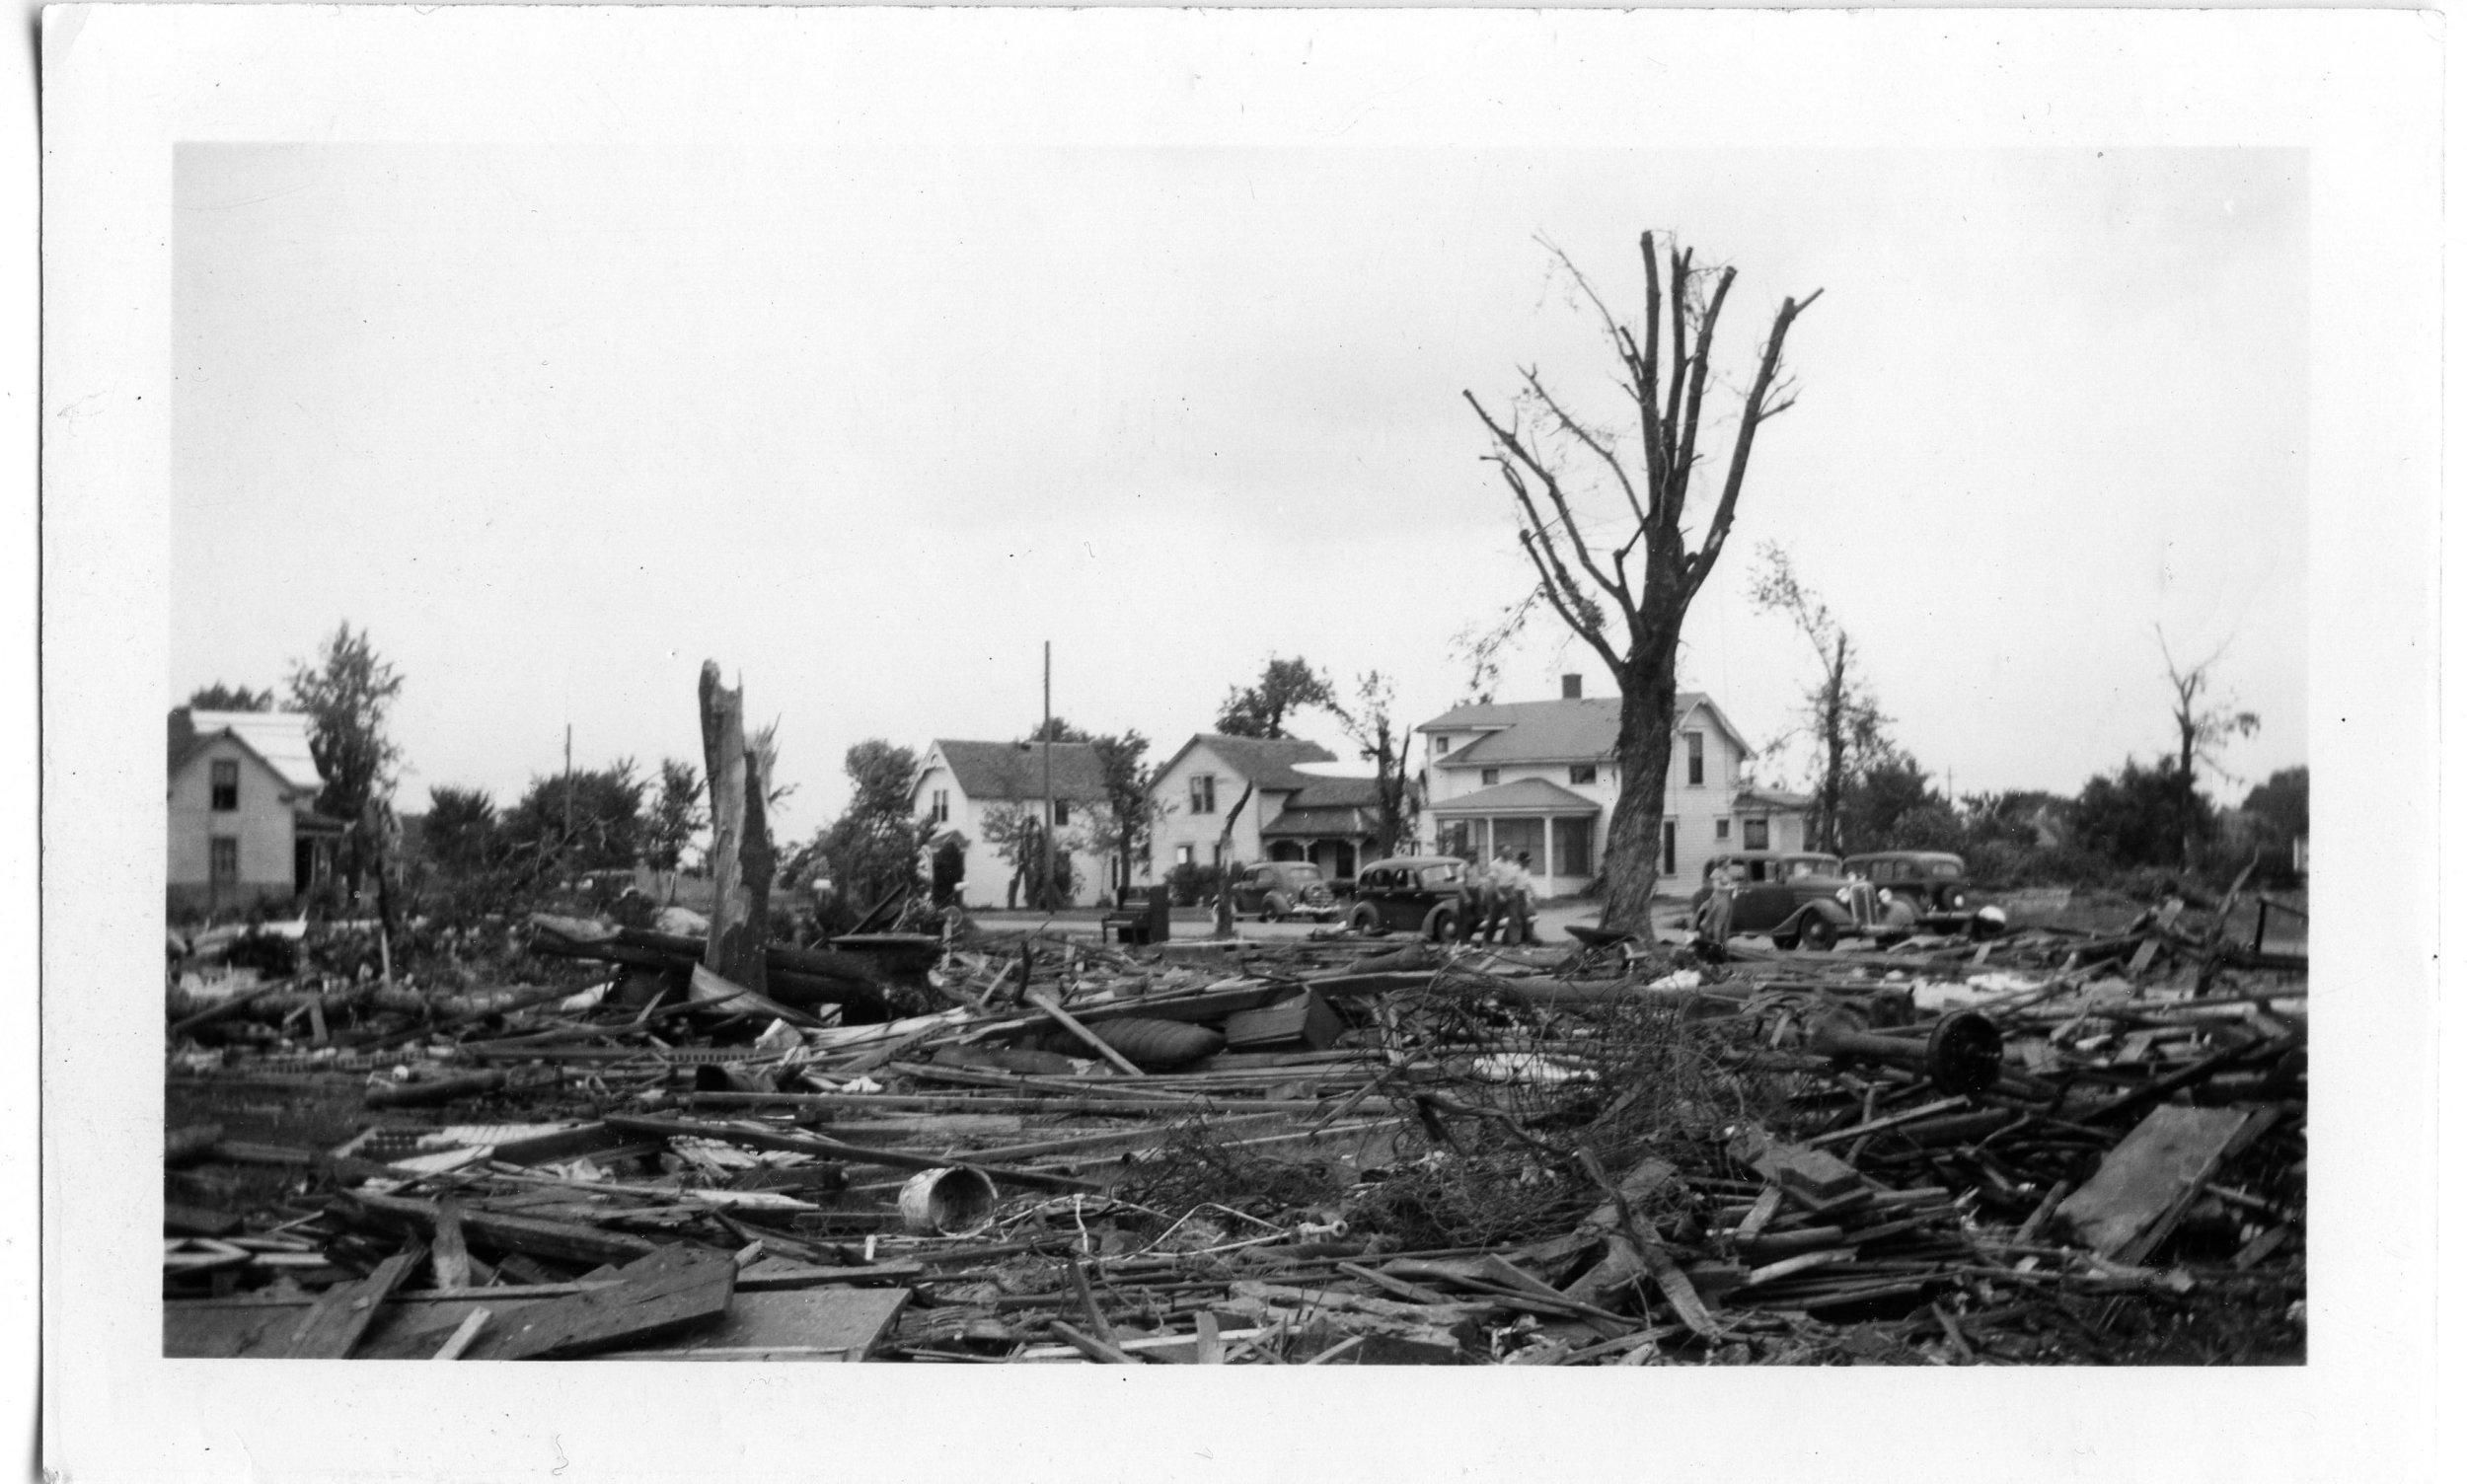 The destruction of the Harrington home.